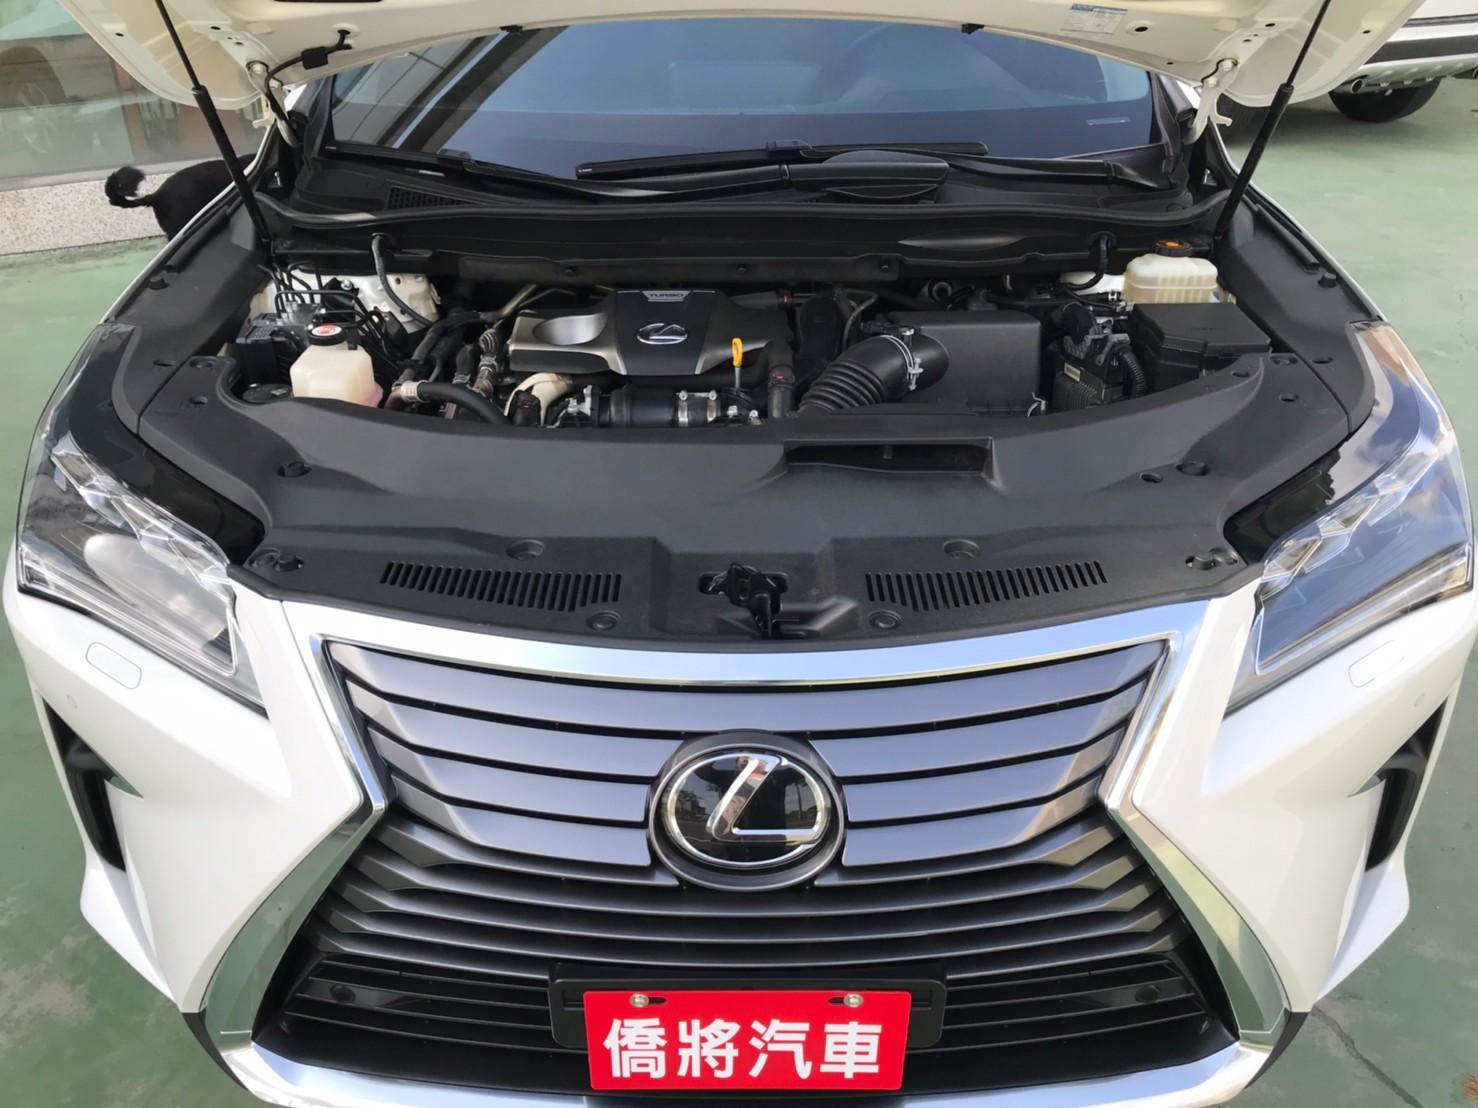 2018RX300白SUM151.8 2.0cc 主動跟車 AEB自動緊急煞車 車道偏離 盲點補助_210620_3